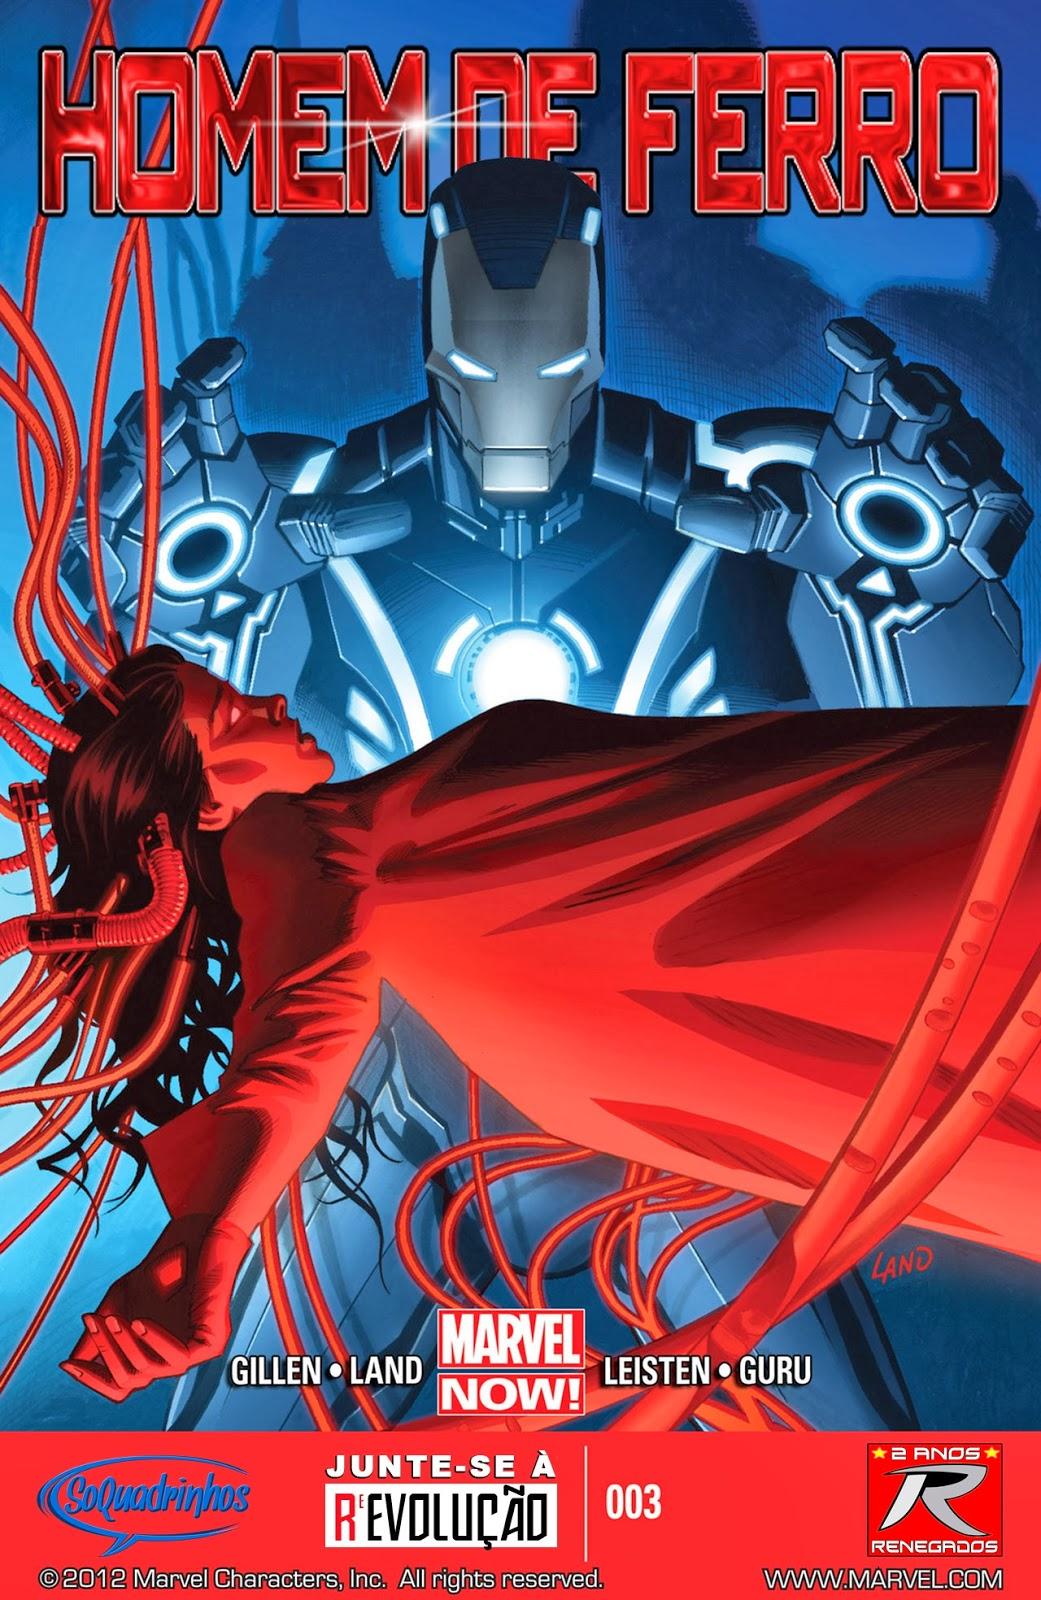 Nova Marvel! Homem de Ferro v6 #3